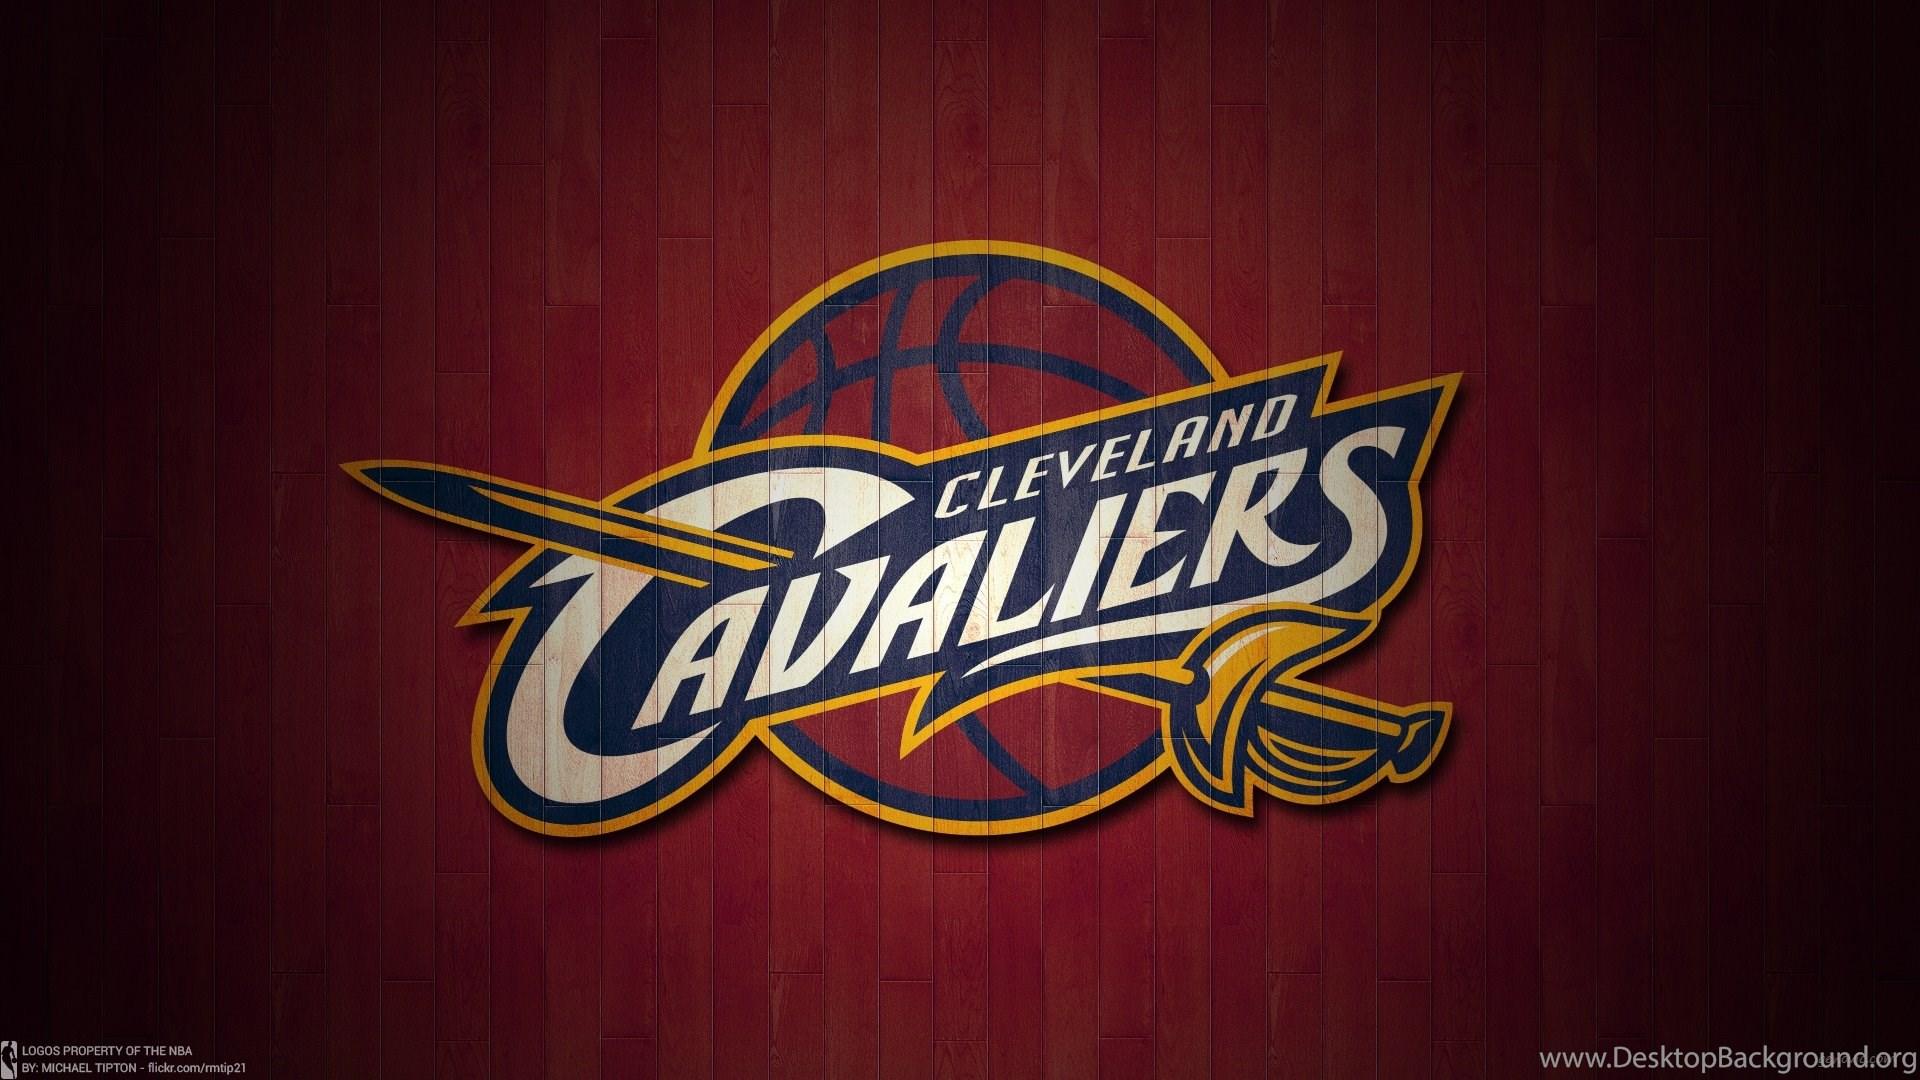 Cleveland Cavaliers Lebron James Dunk Wallpaper Desktop Background